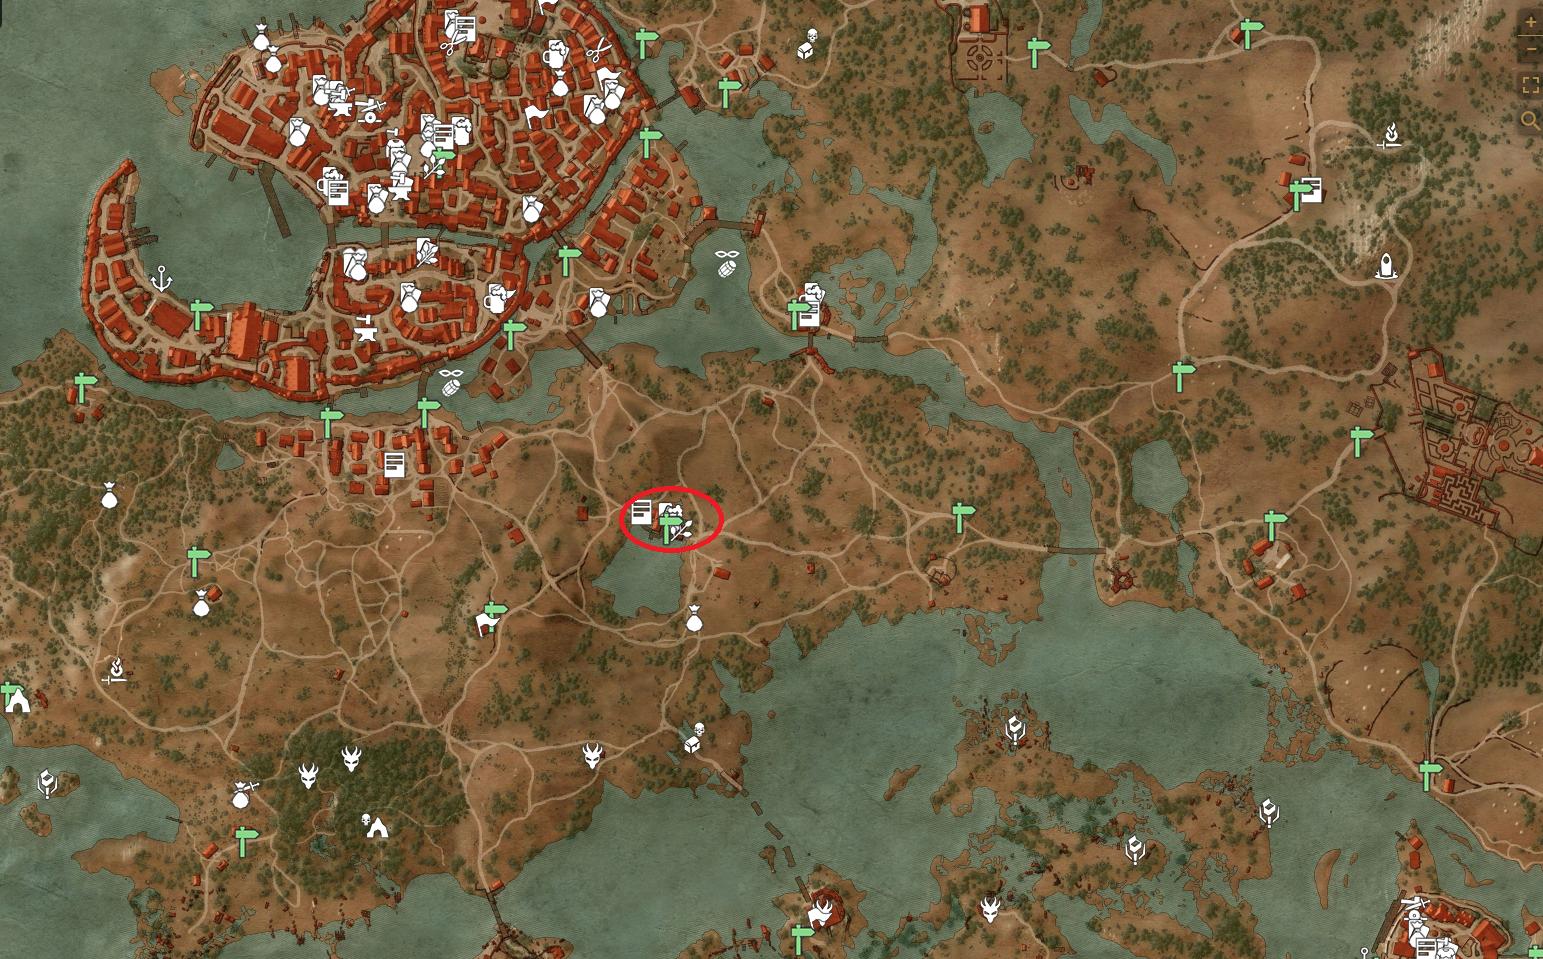 Barber Novigrad : Novigrad Map Related Keywords & Suggestions - Novigrad Map Long Tail ...